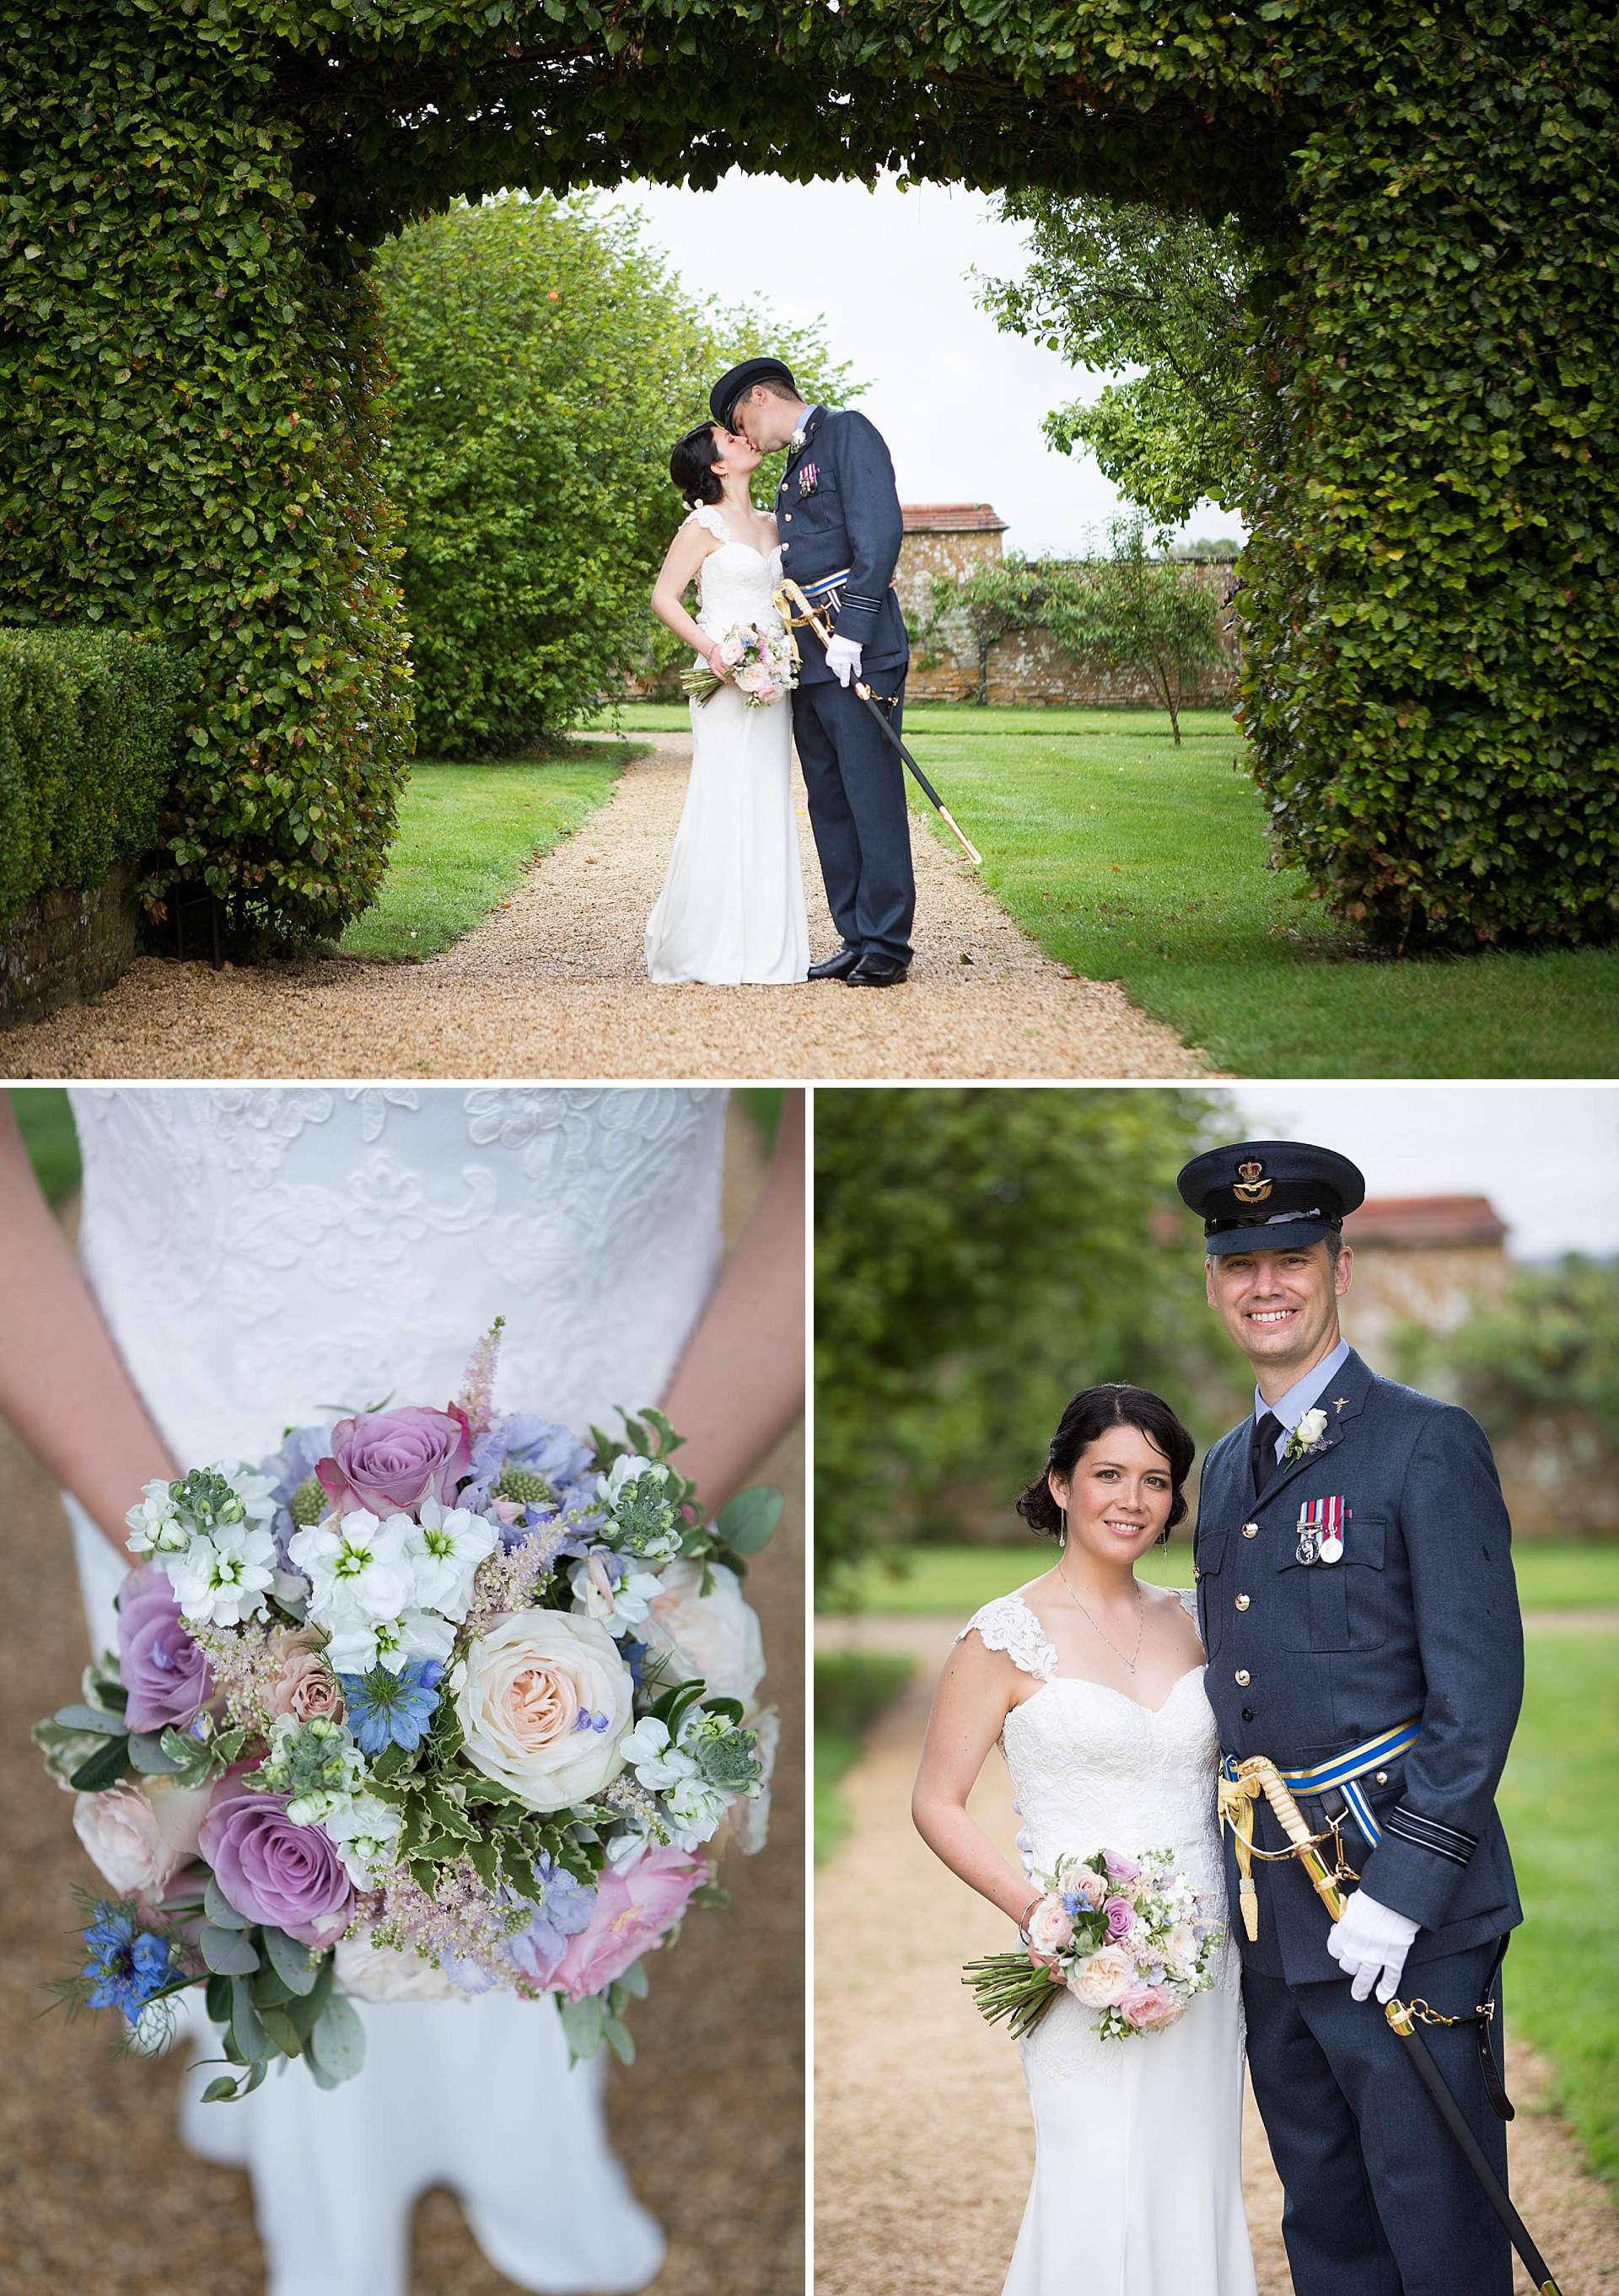 Poundon House wedding portraits